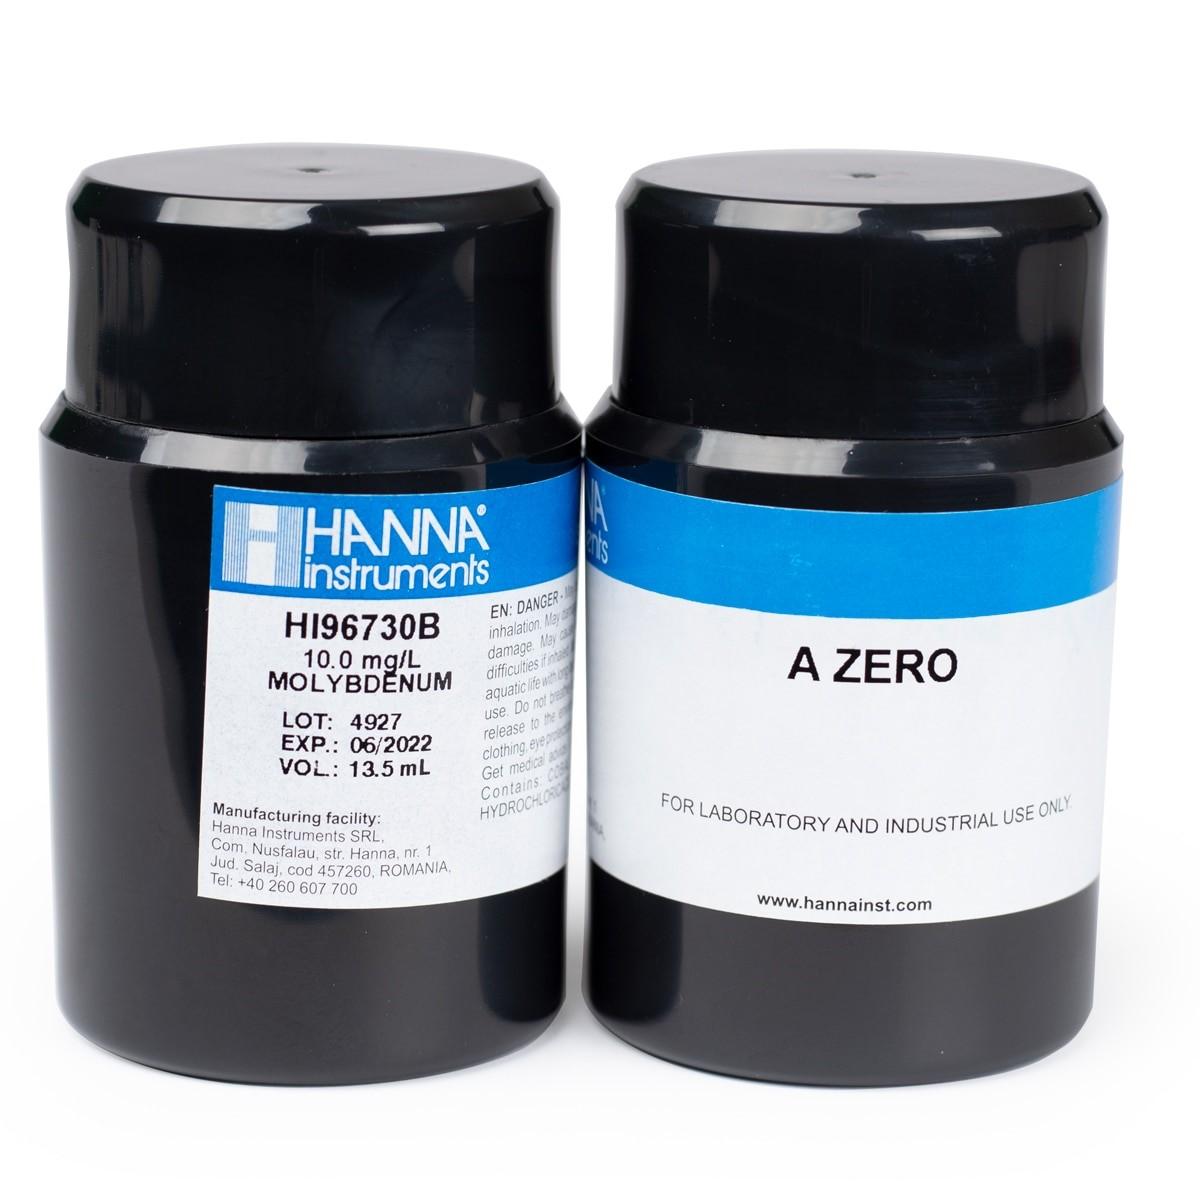 HI96730-11 Molybdenum CAL Check™ Standards